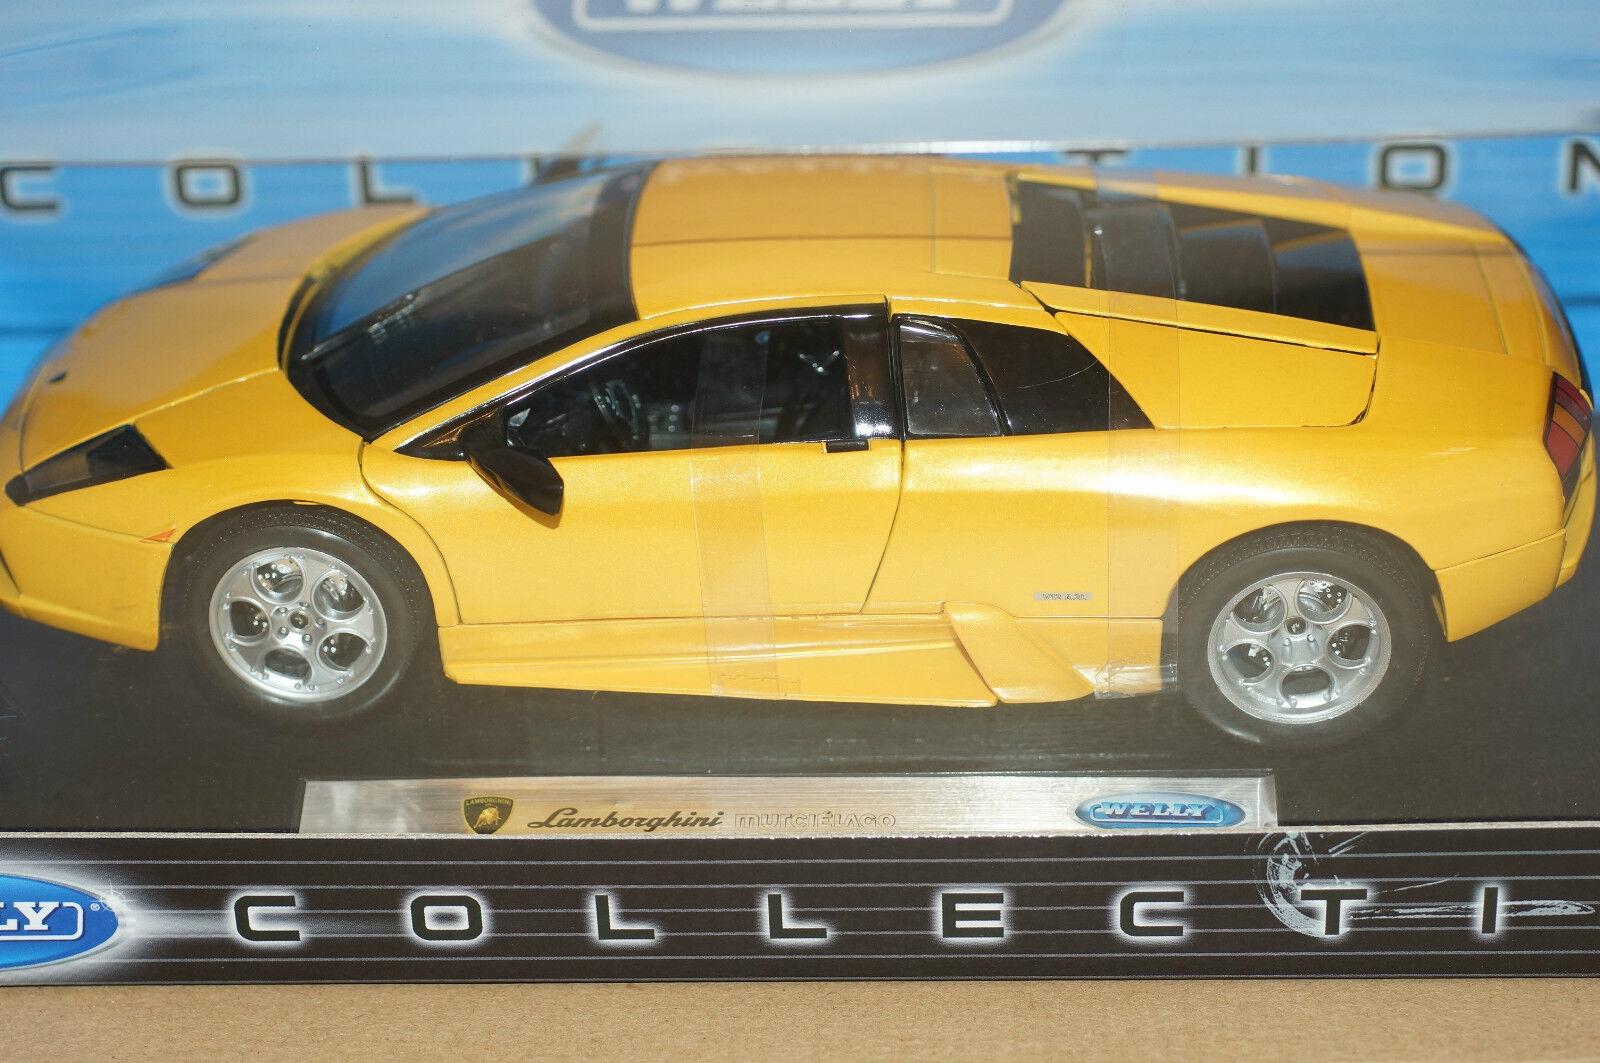 Rare Lamborghini Murcielago Yellow Opening Parts Model 1 18 Mint in Box Stunner